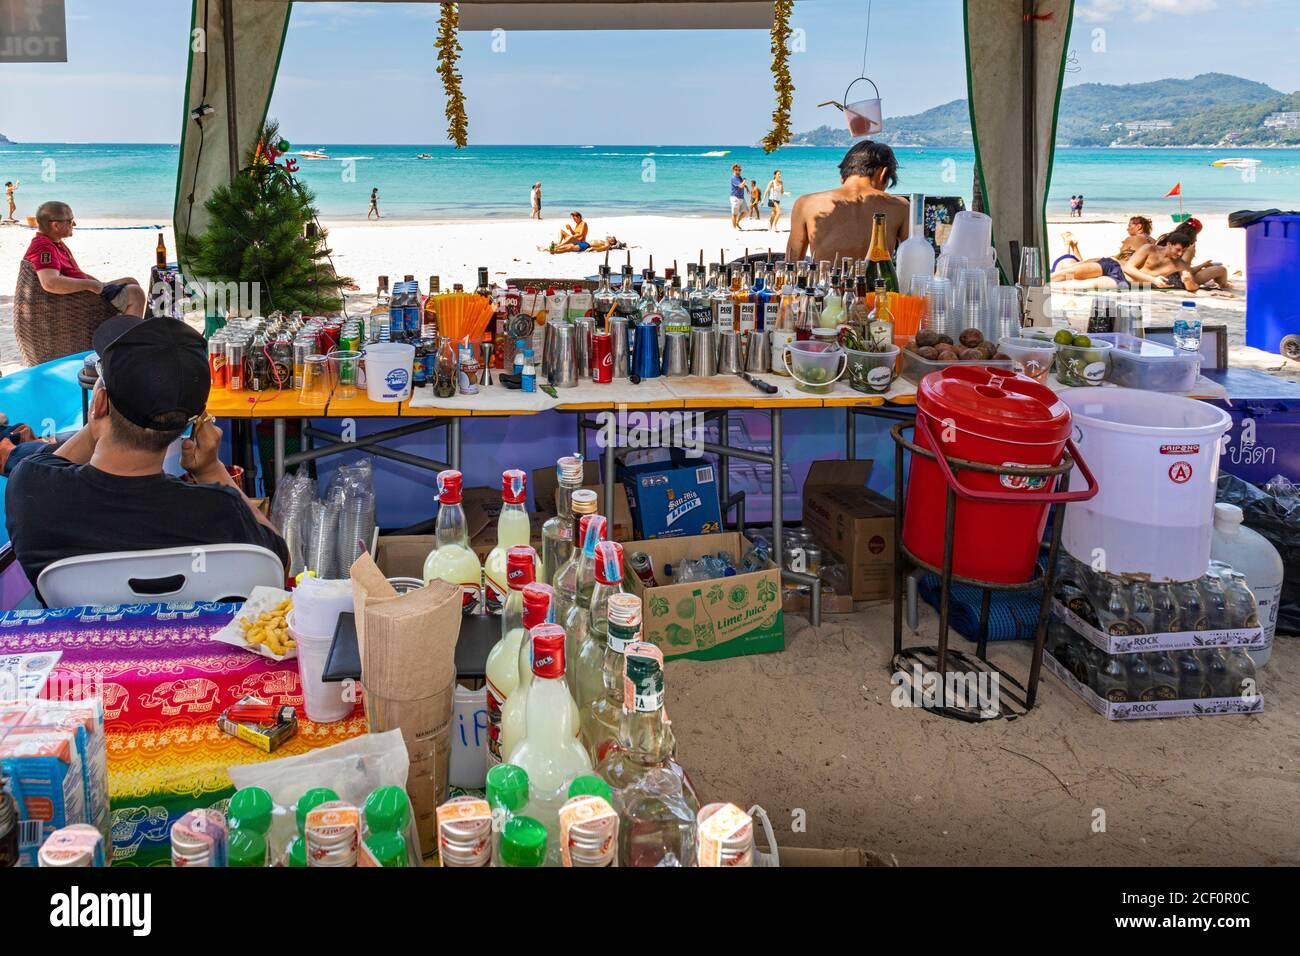 Beach bar on the sand at Patong, Phuket, Thailand Stock Photo